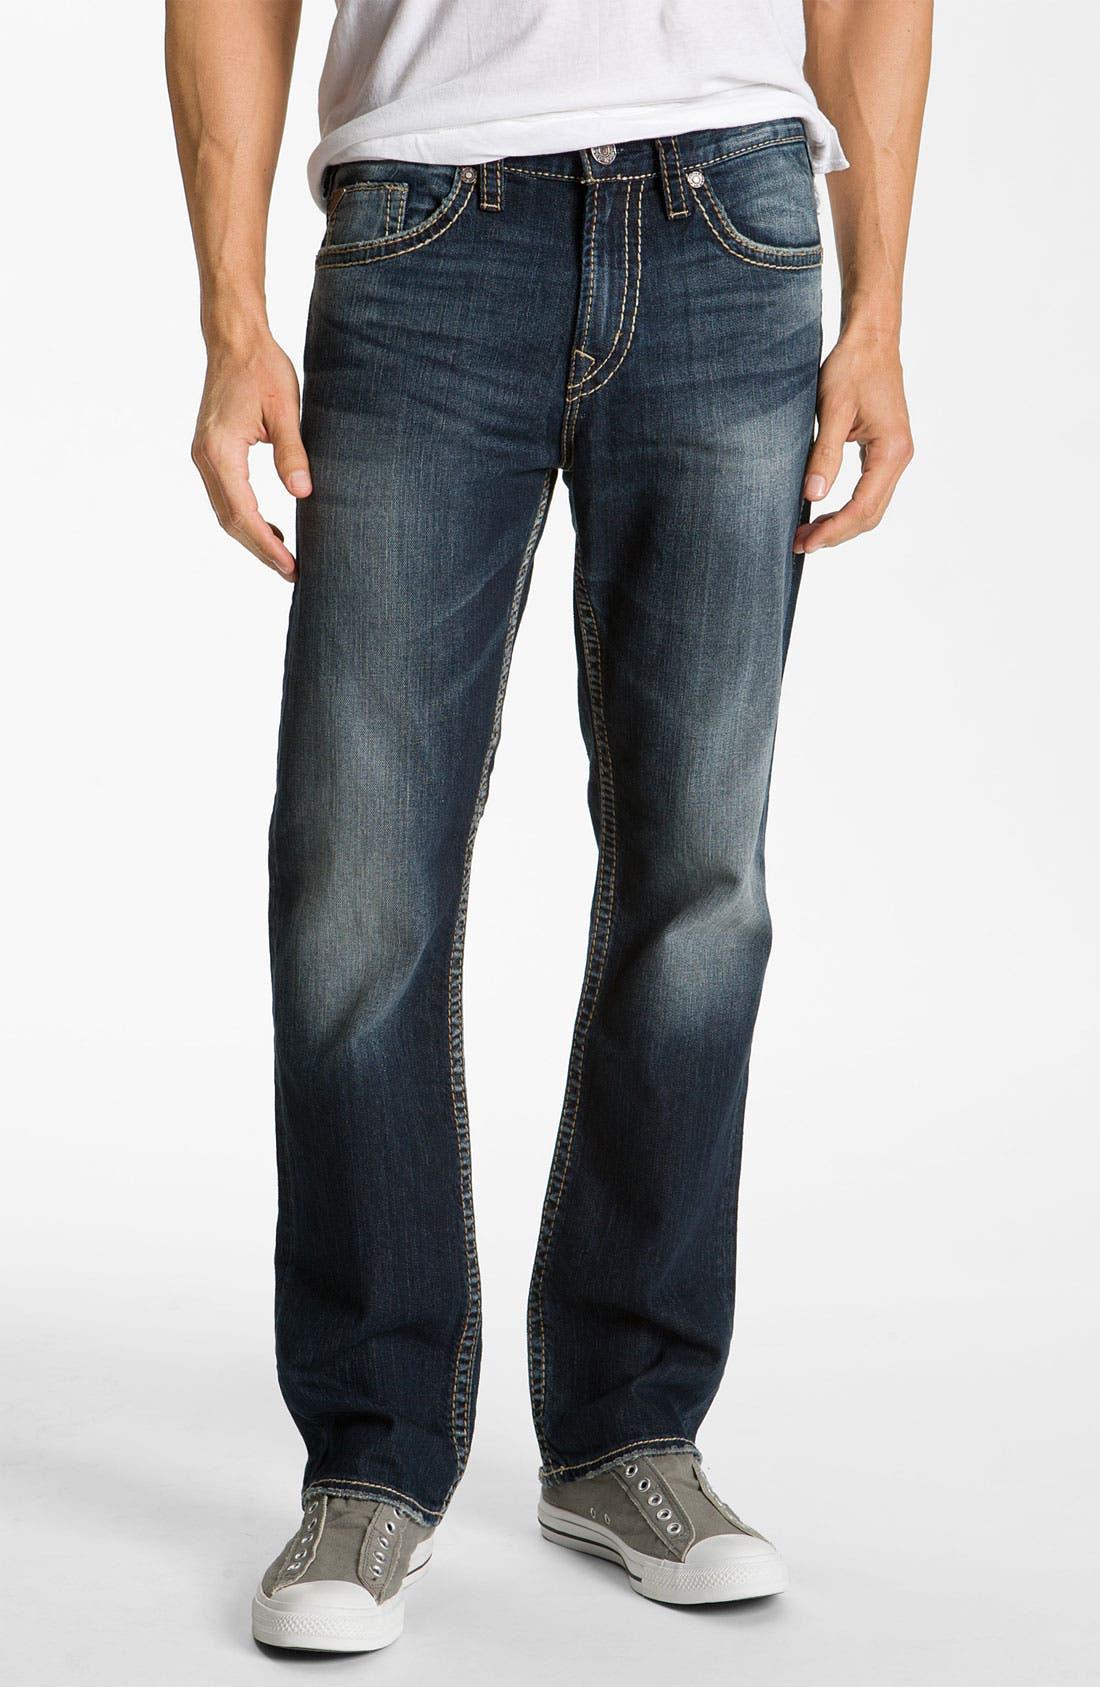 SILVER JEANS CO.,                             'Grayson Heritage' Straight Leg Jeans,                             Alternate thumbnail 4, color,                             401